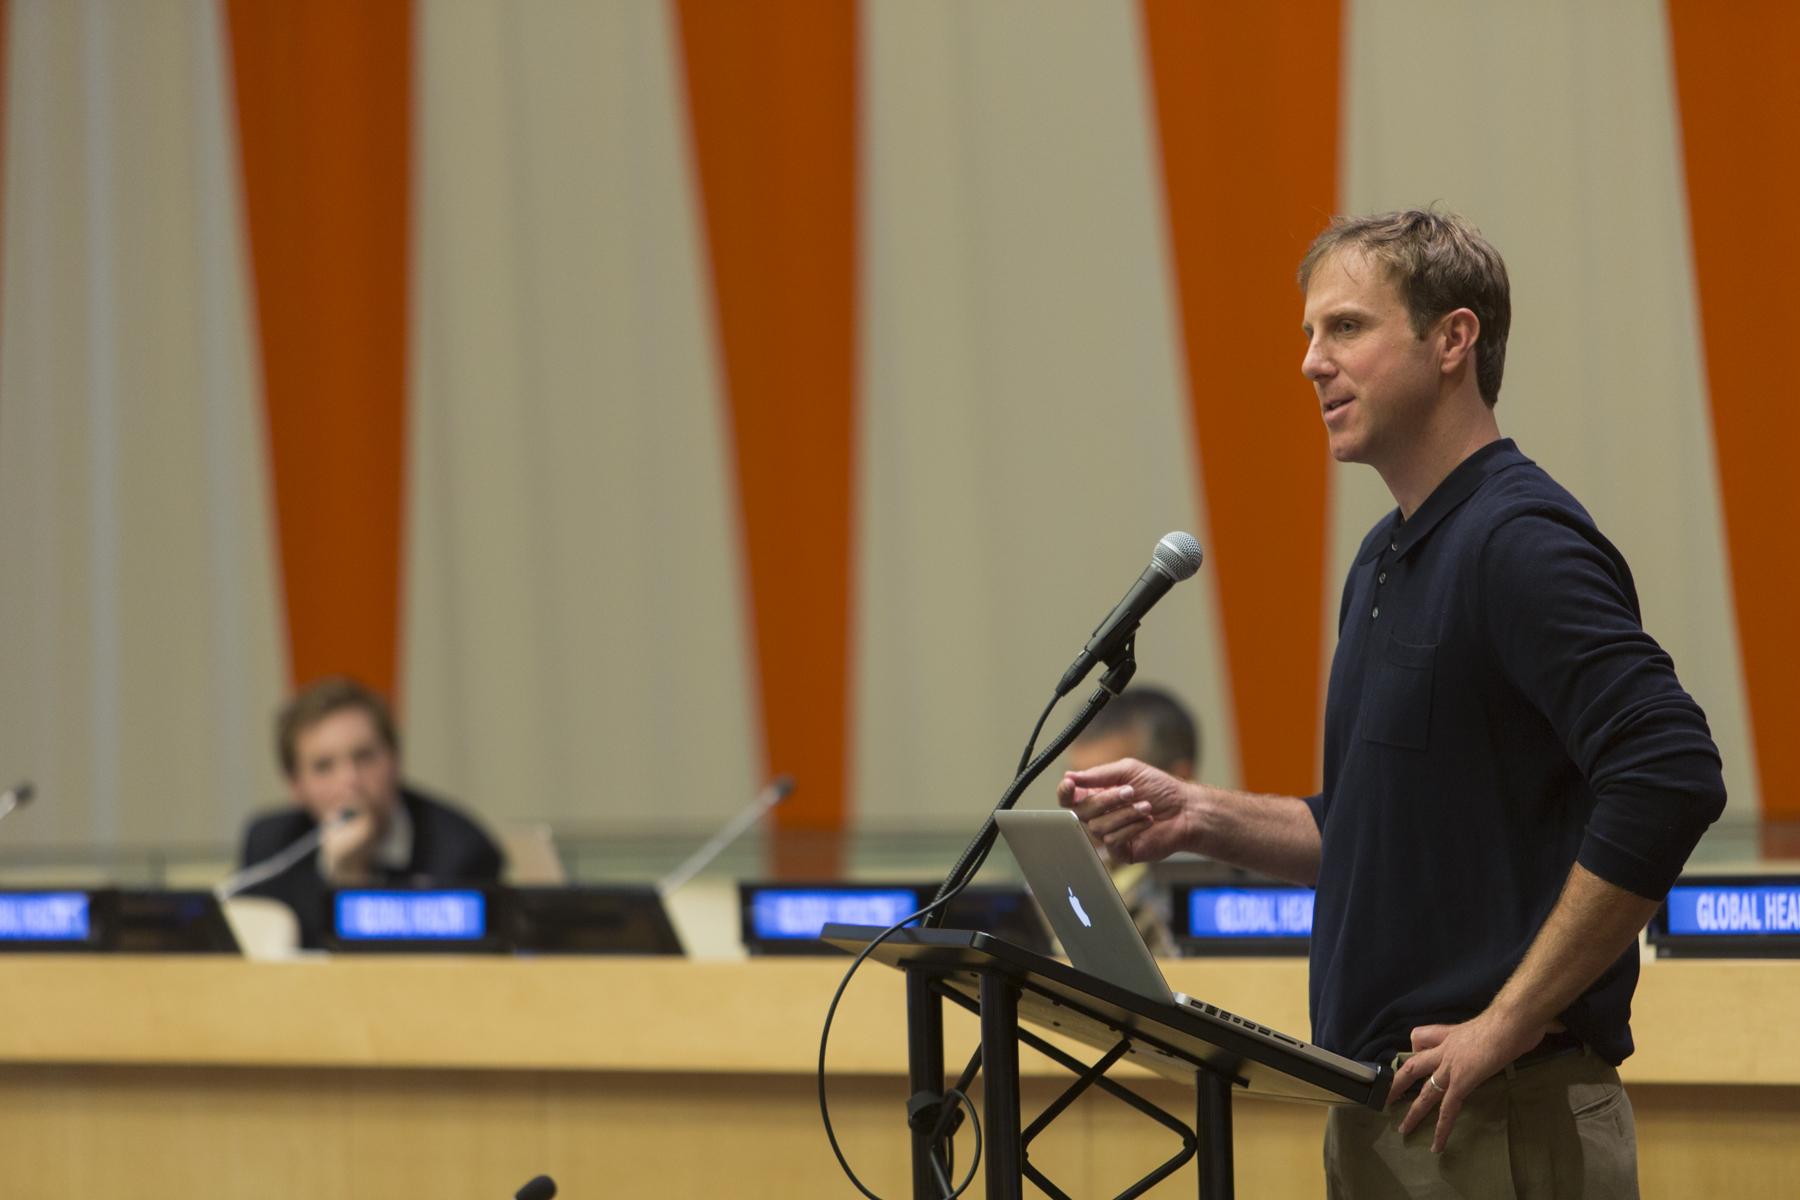 Innovation Partner presentation at the 2014 United Nations Forum